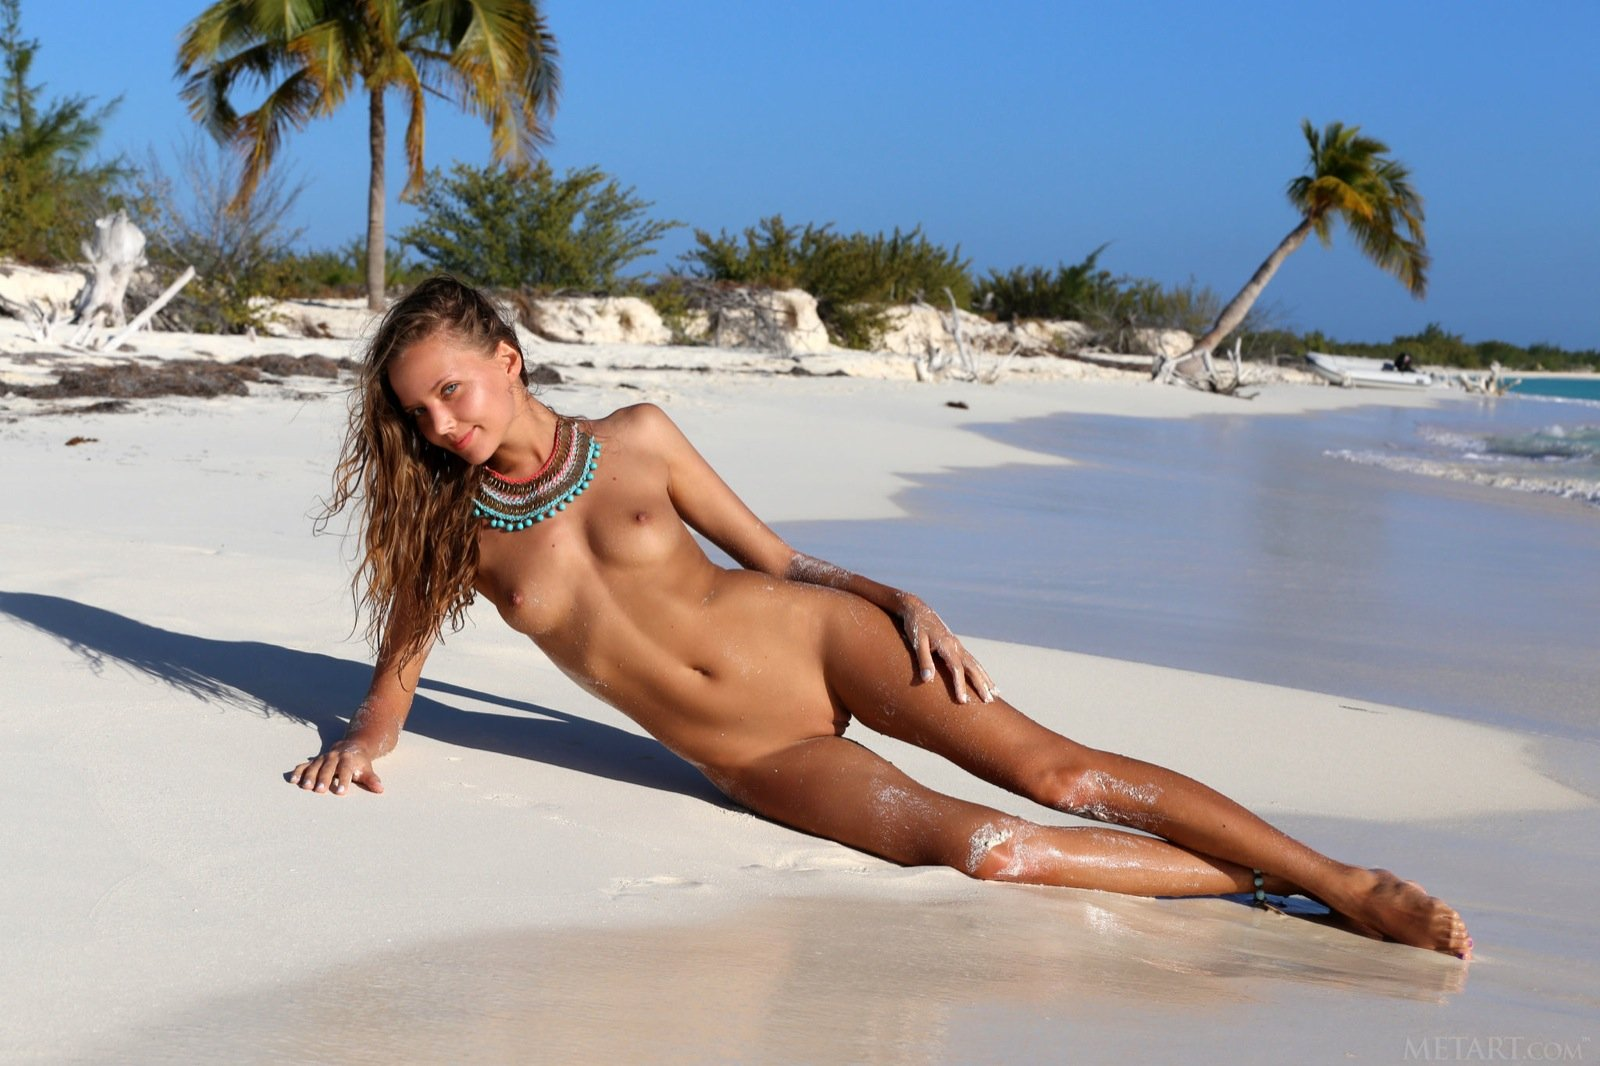 Фото Обнаженных Девушек На Пляже